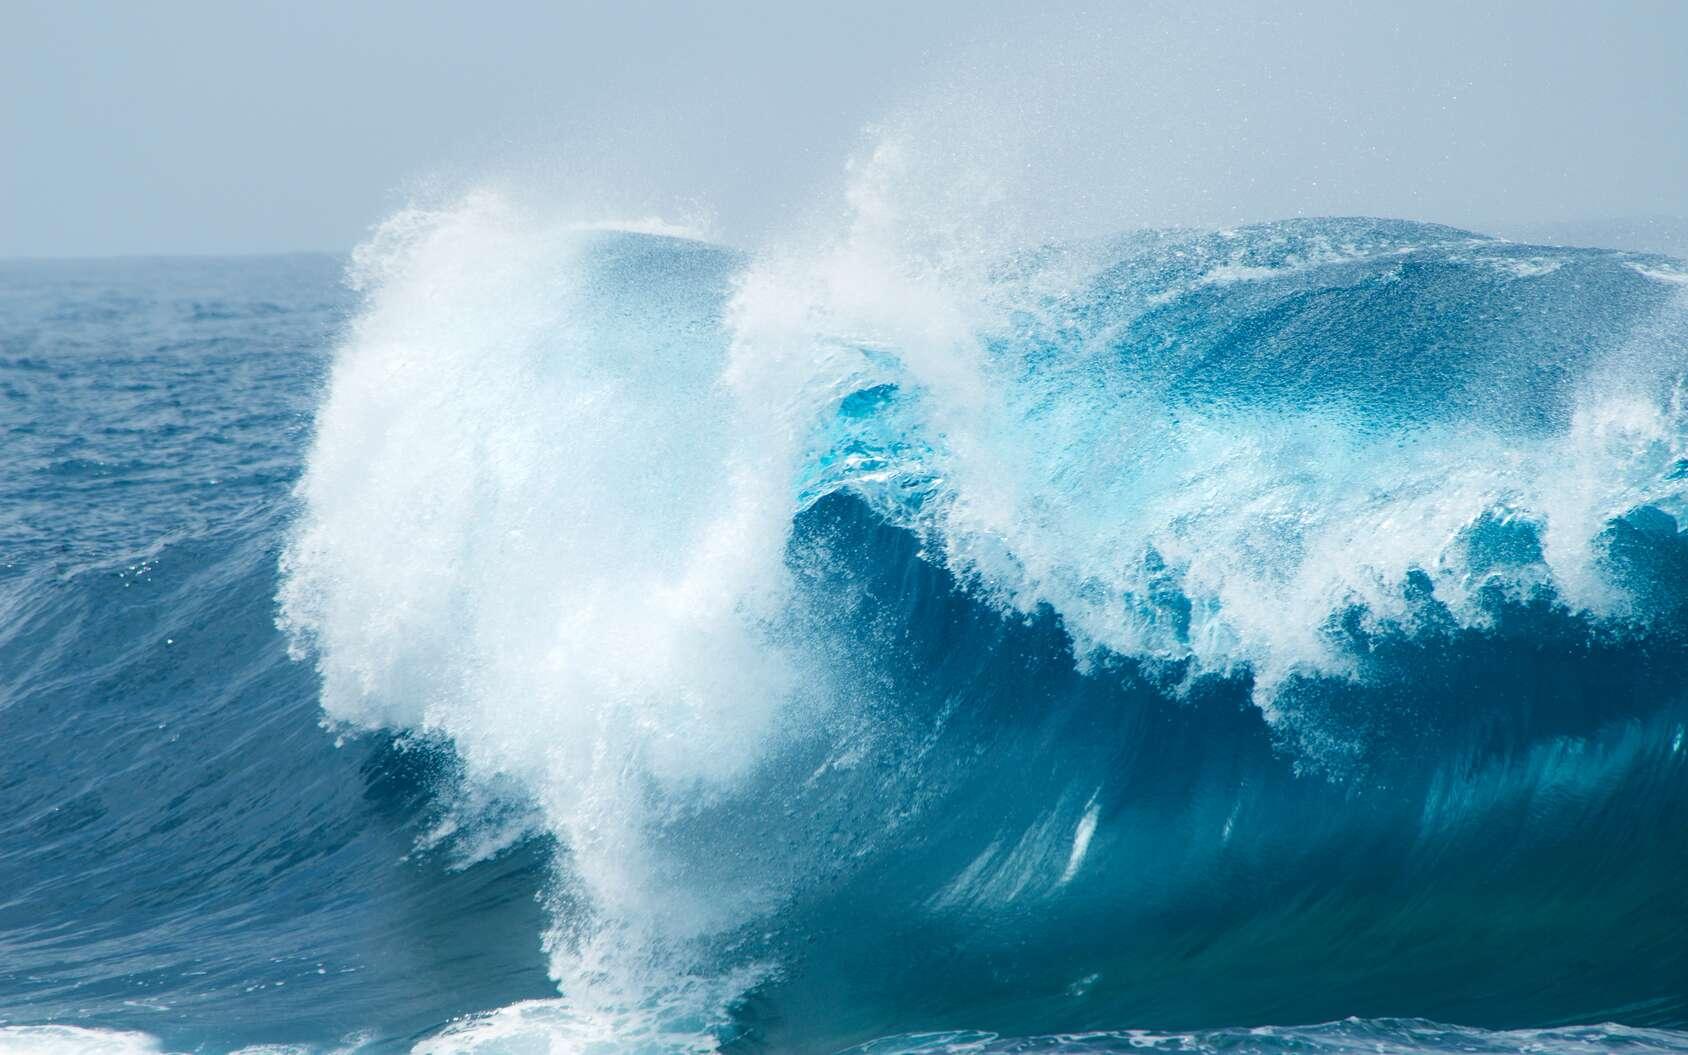 Vagues sur l'océan. © Tamara Kulikova, fotolia